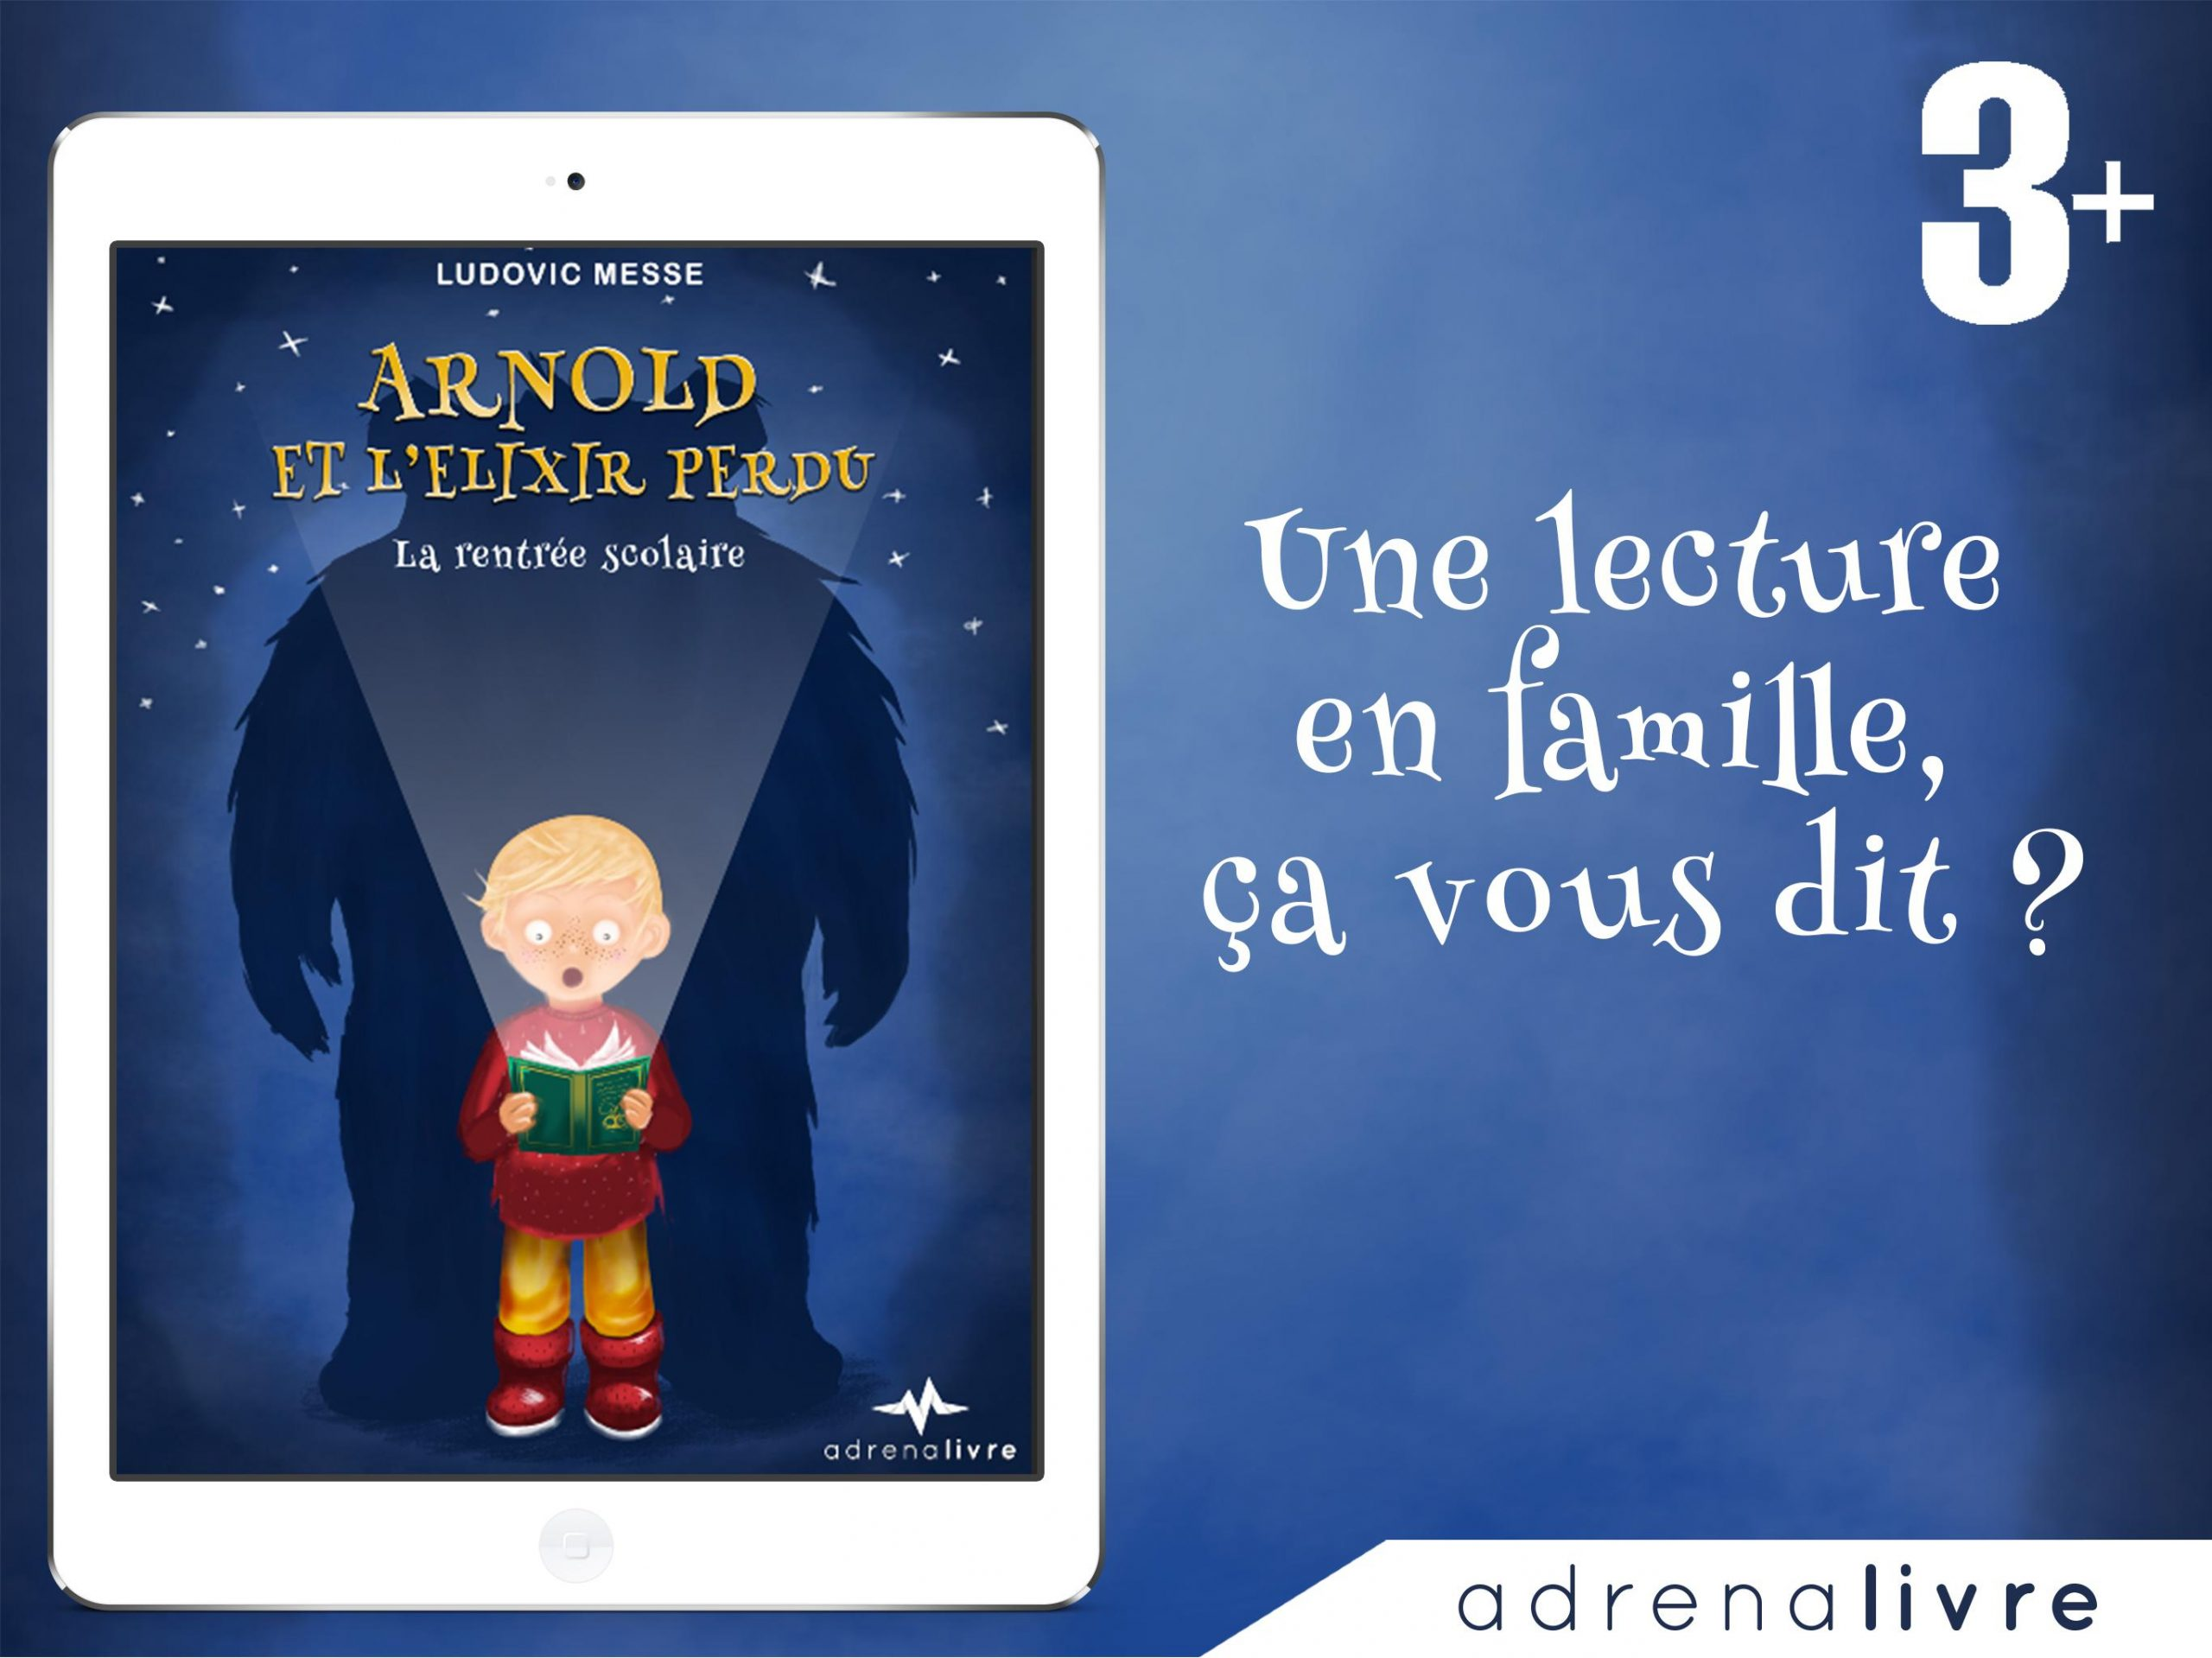 Arnold Et L'élixir Perdu, Livre-Jeu Interactif For Android - Apk à Livre Jeu Interactif